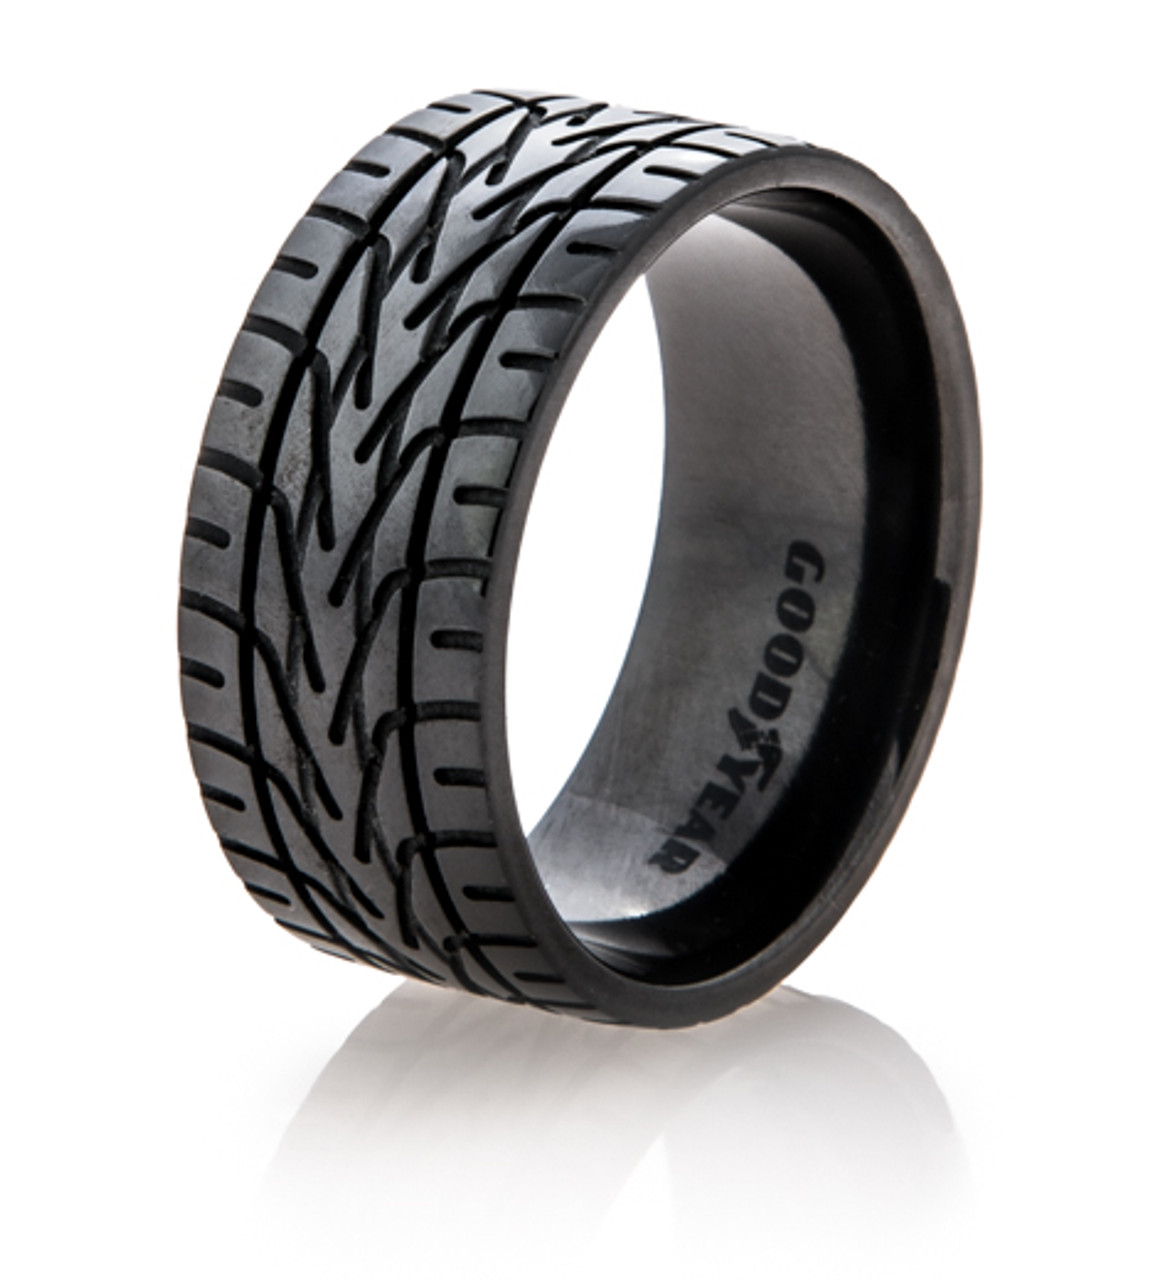 Black Goodyear Nascar Tire Tread Ring  Titaniumbuzz. Large Aquamarine Diamond Wedding Rings. 5 Stone Engagement Rings. Seven Stone Engagement Rings. Orca Rings. Dome Wedding Rings. Big Wedding Rings. Native American Wedding Rings. Strong Wedding Rings